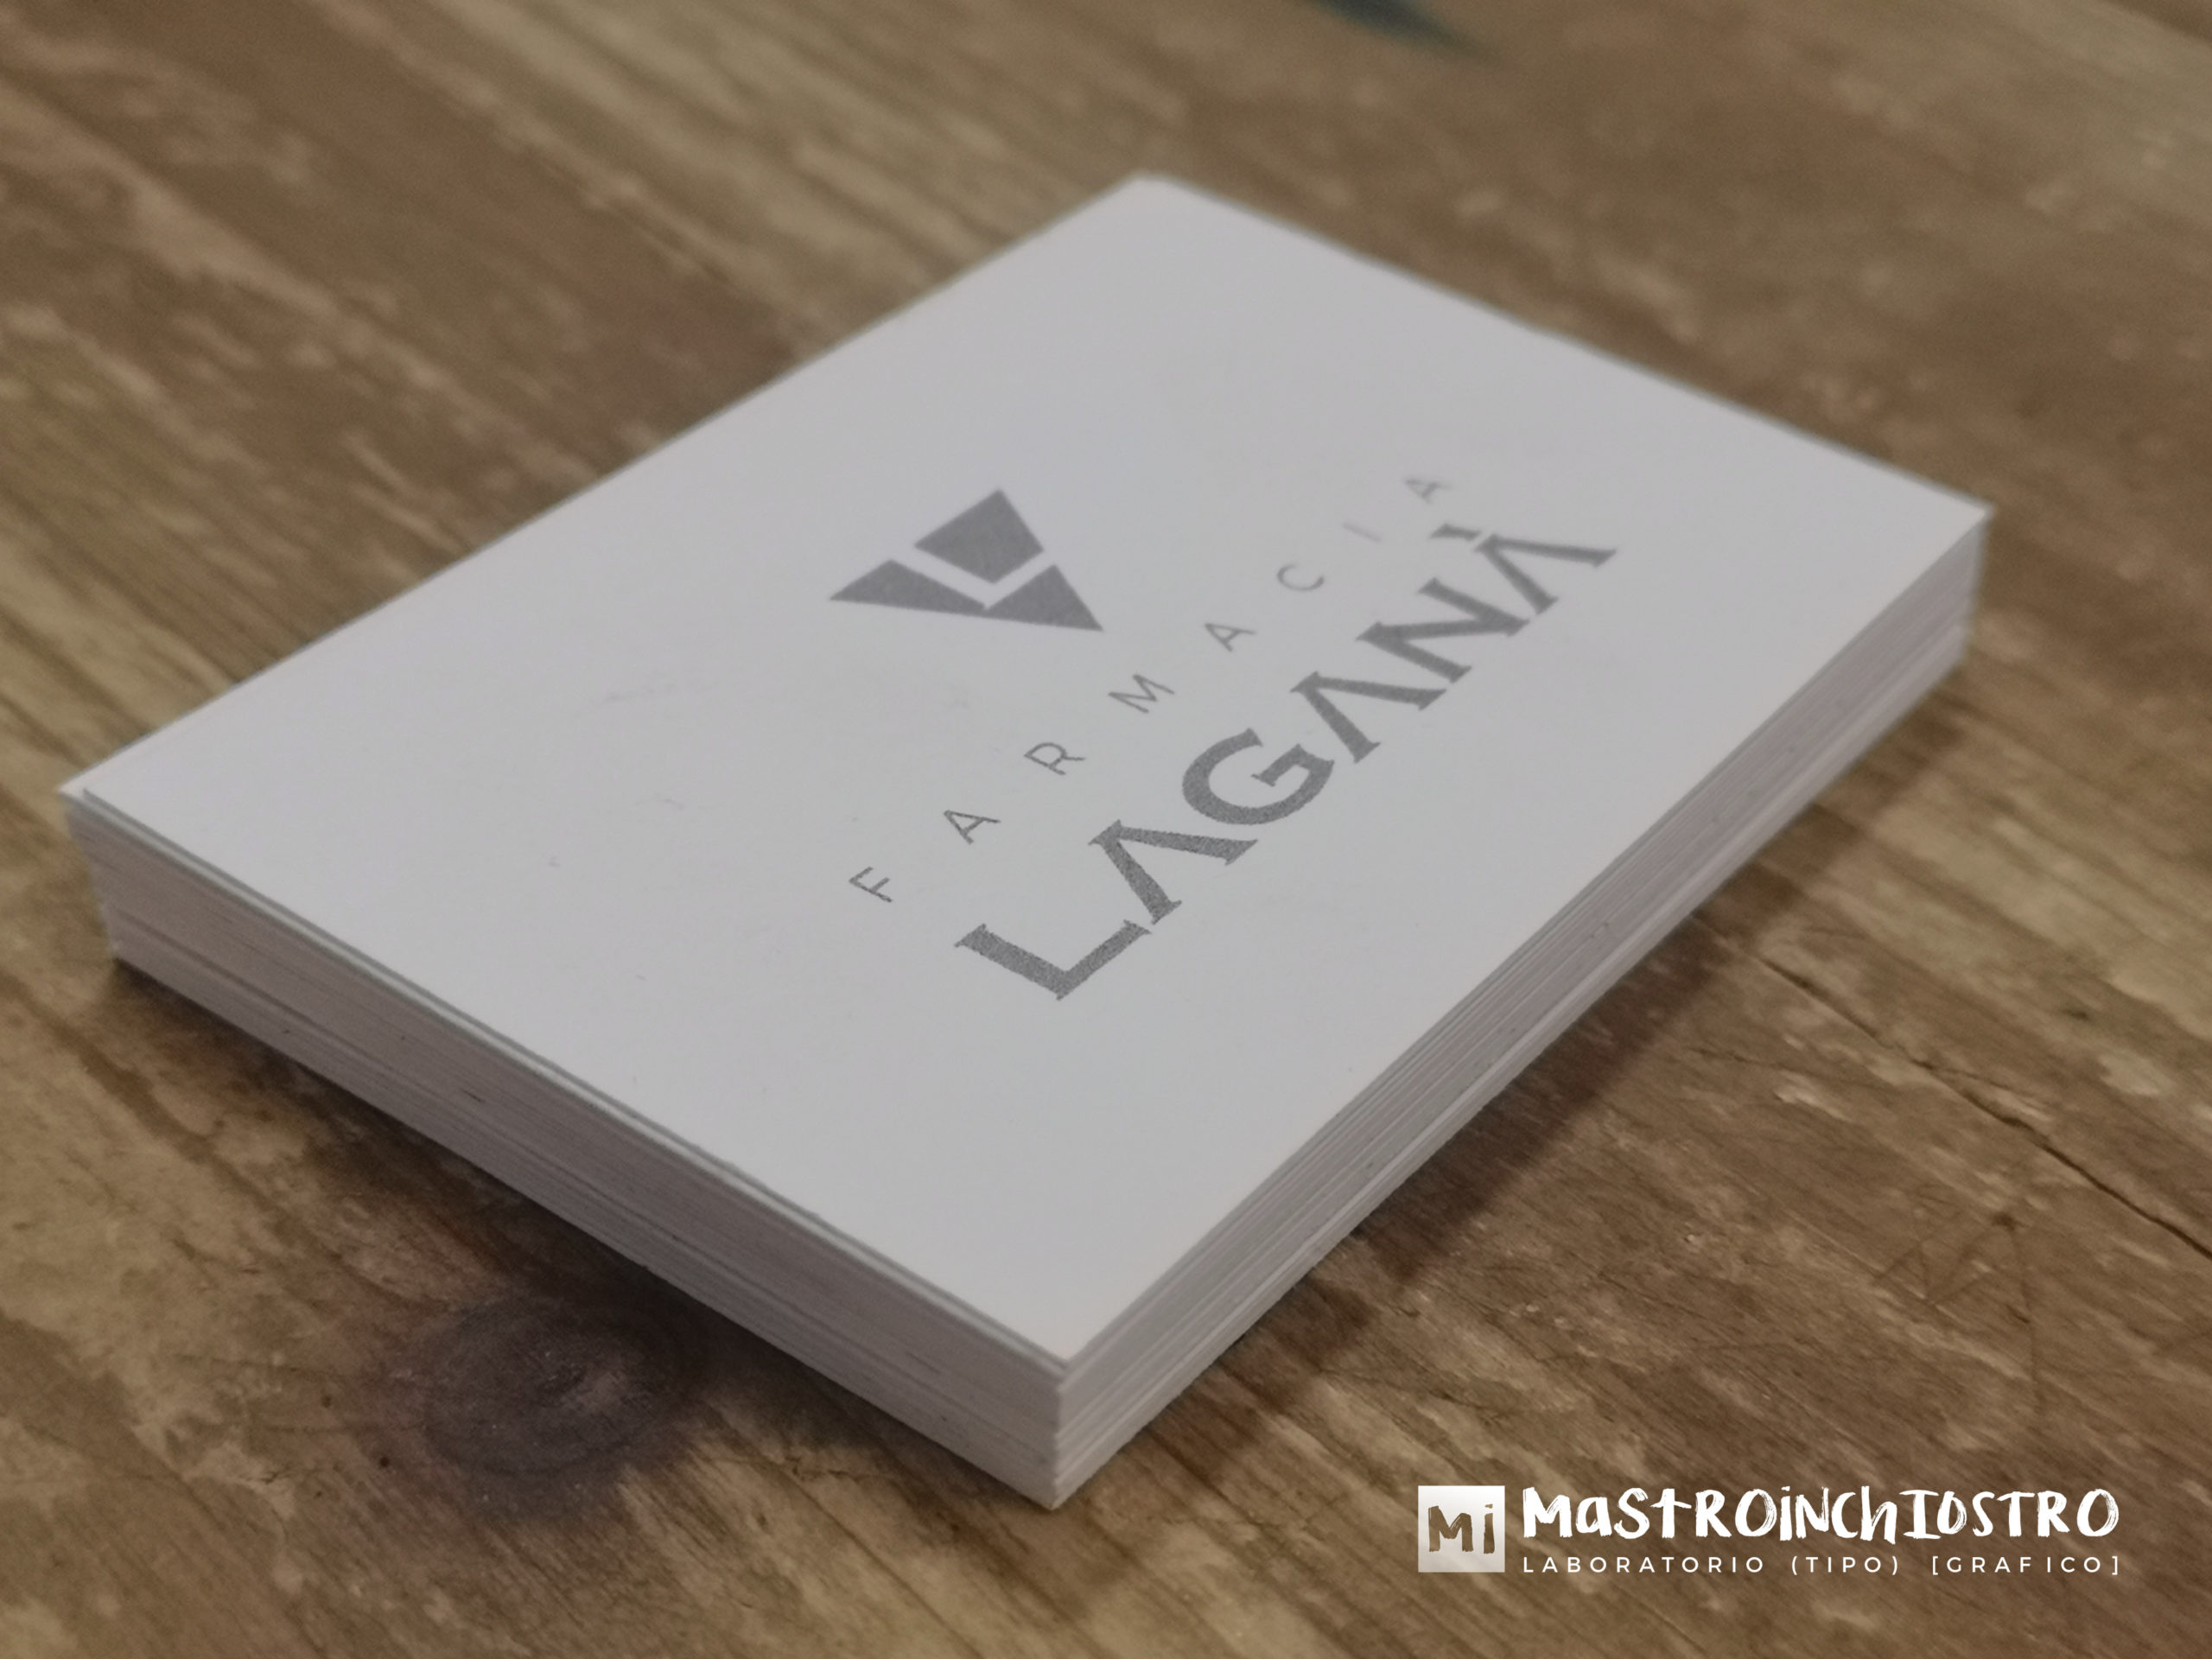 Logo rebranding & business cards Farmacia Laganà | MASTROiNCHIOSTRO